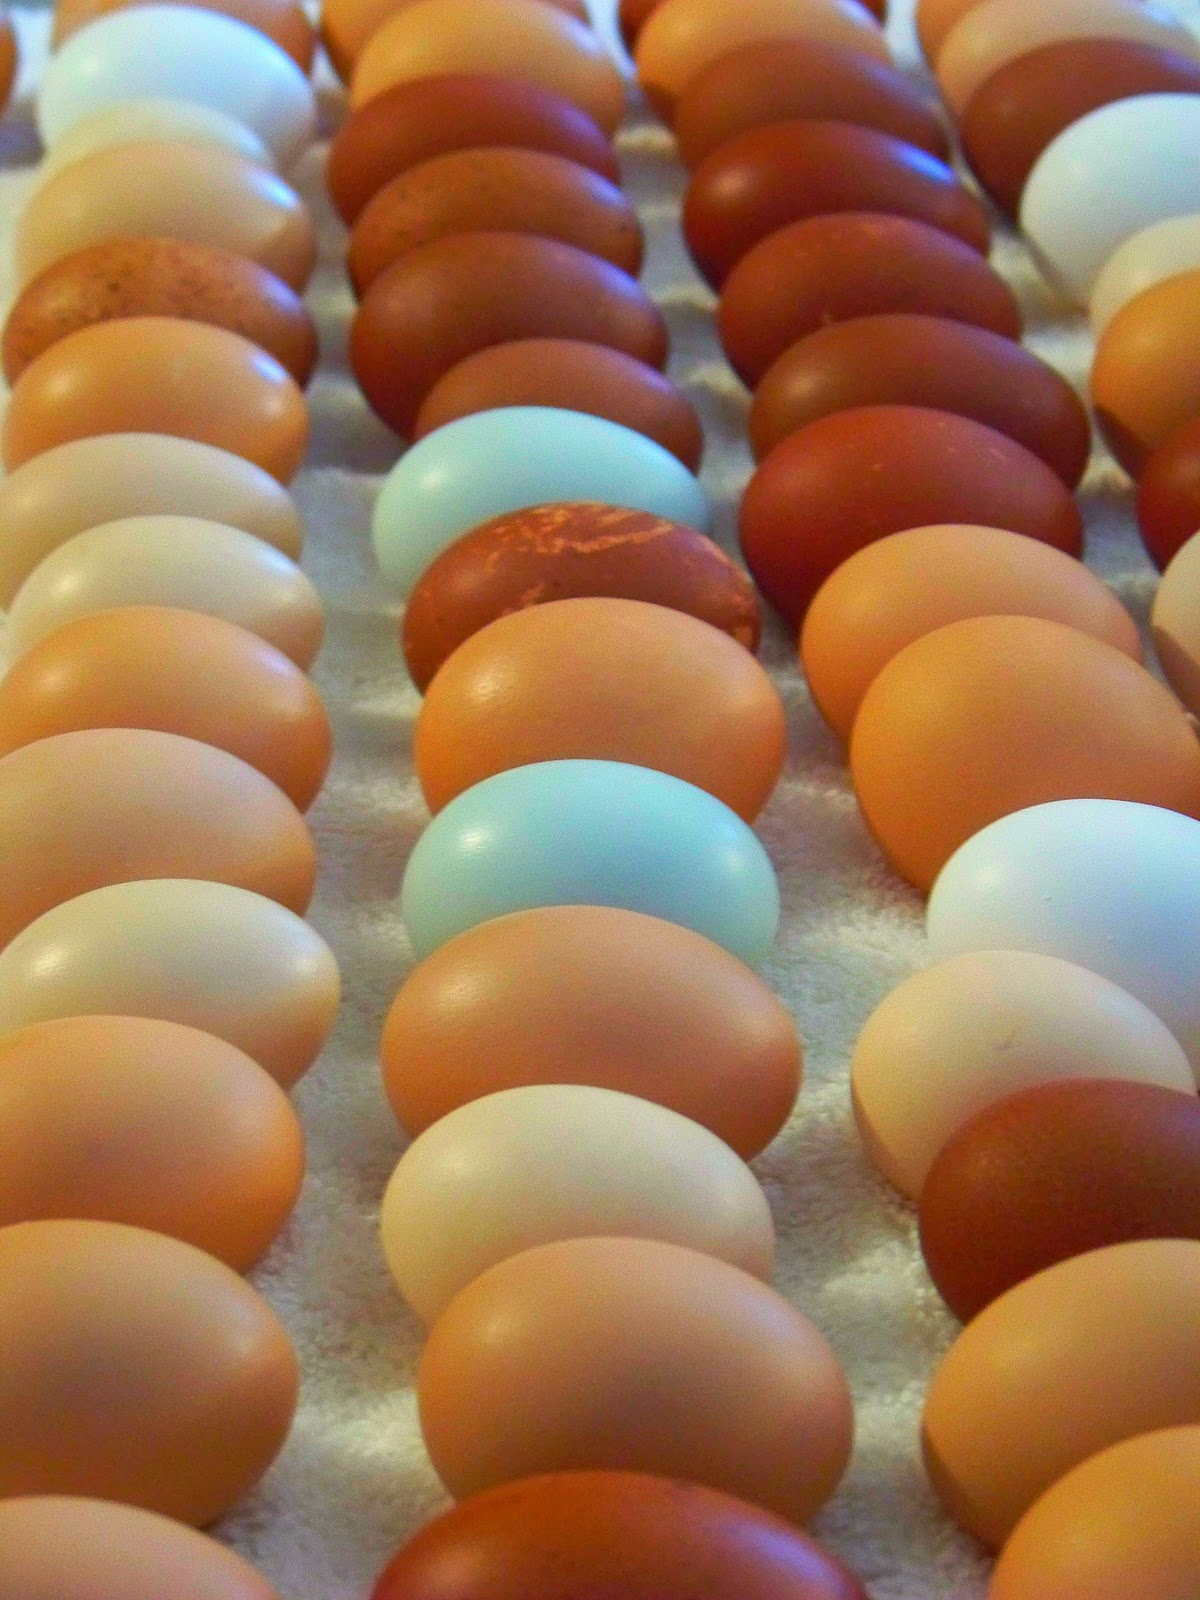 Iron Oak Farm How To Wash Eggs Again